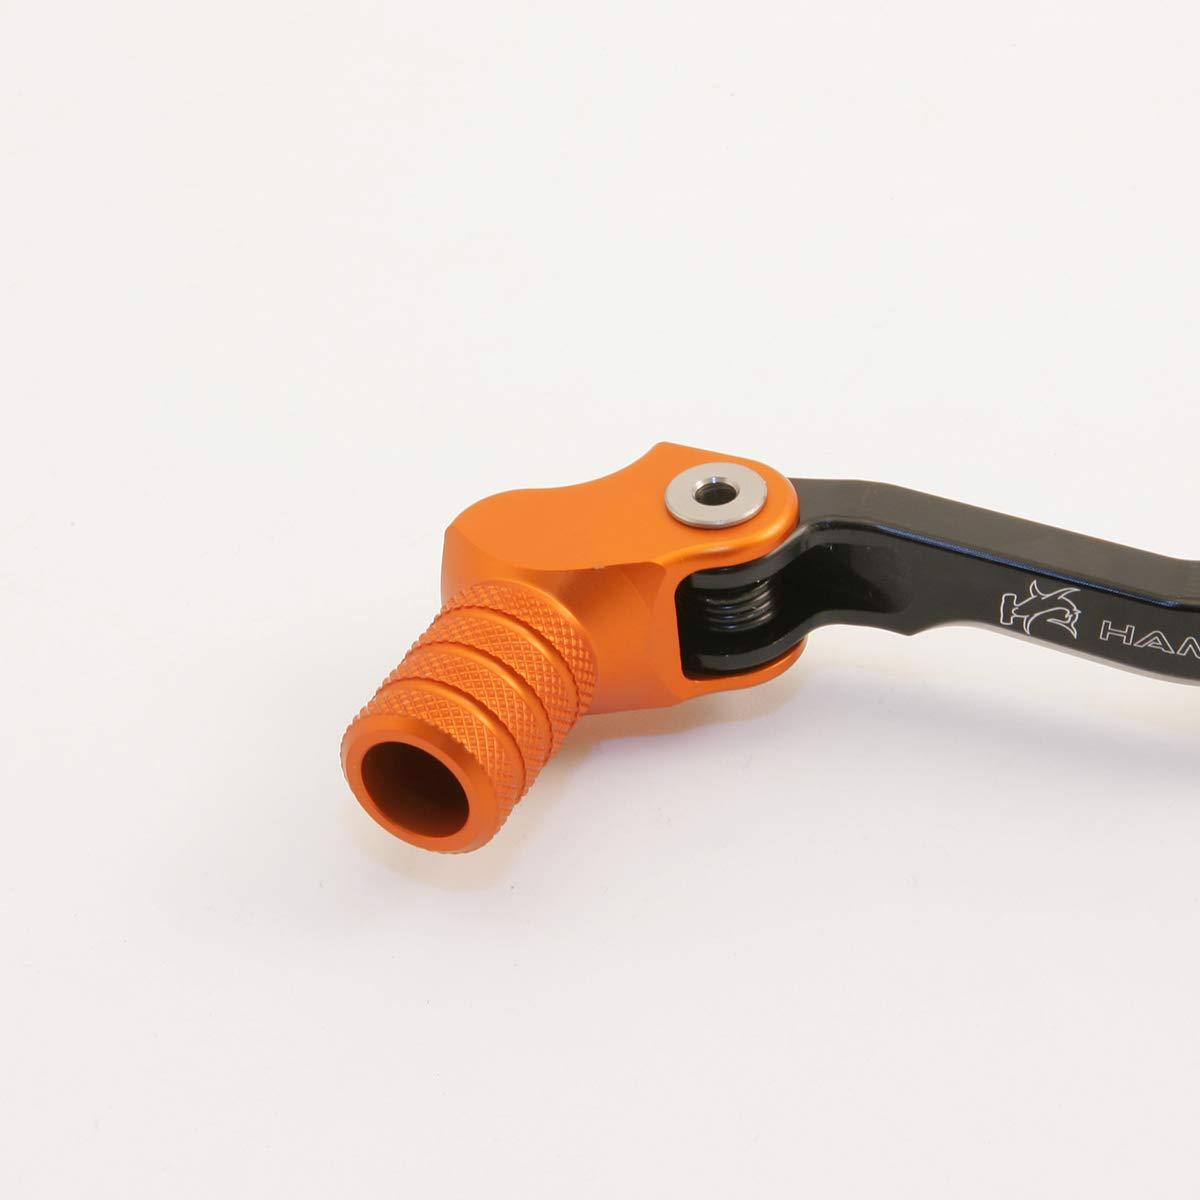 Hammerhead CNC Billet Black Shift Lever for BMW Water Cooled R1200GS tip options